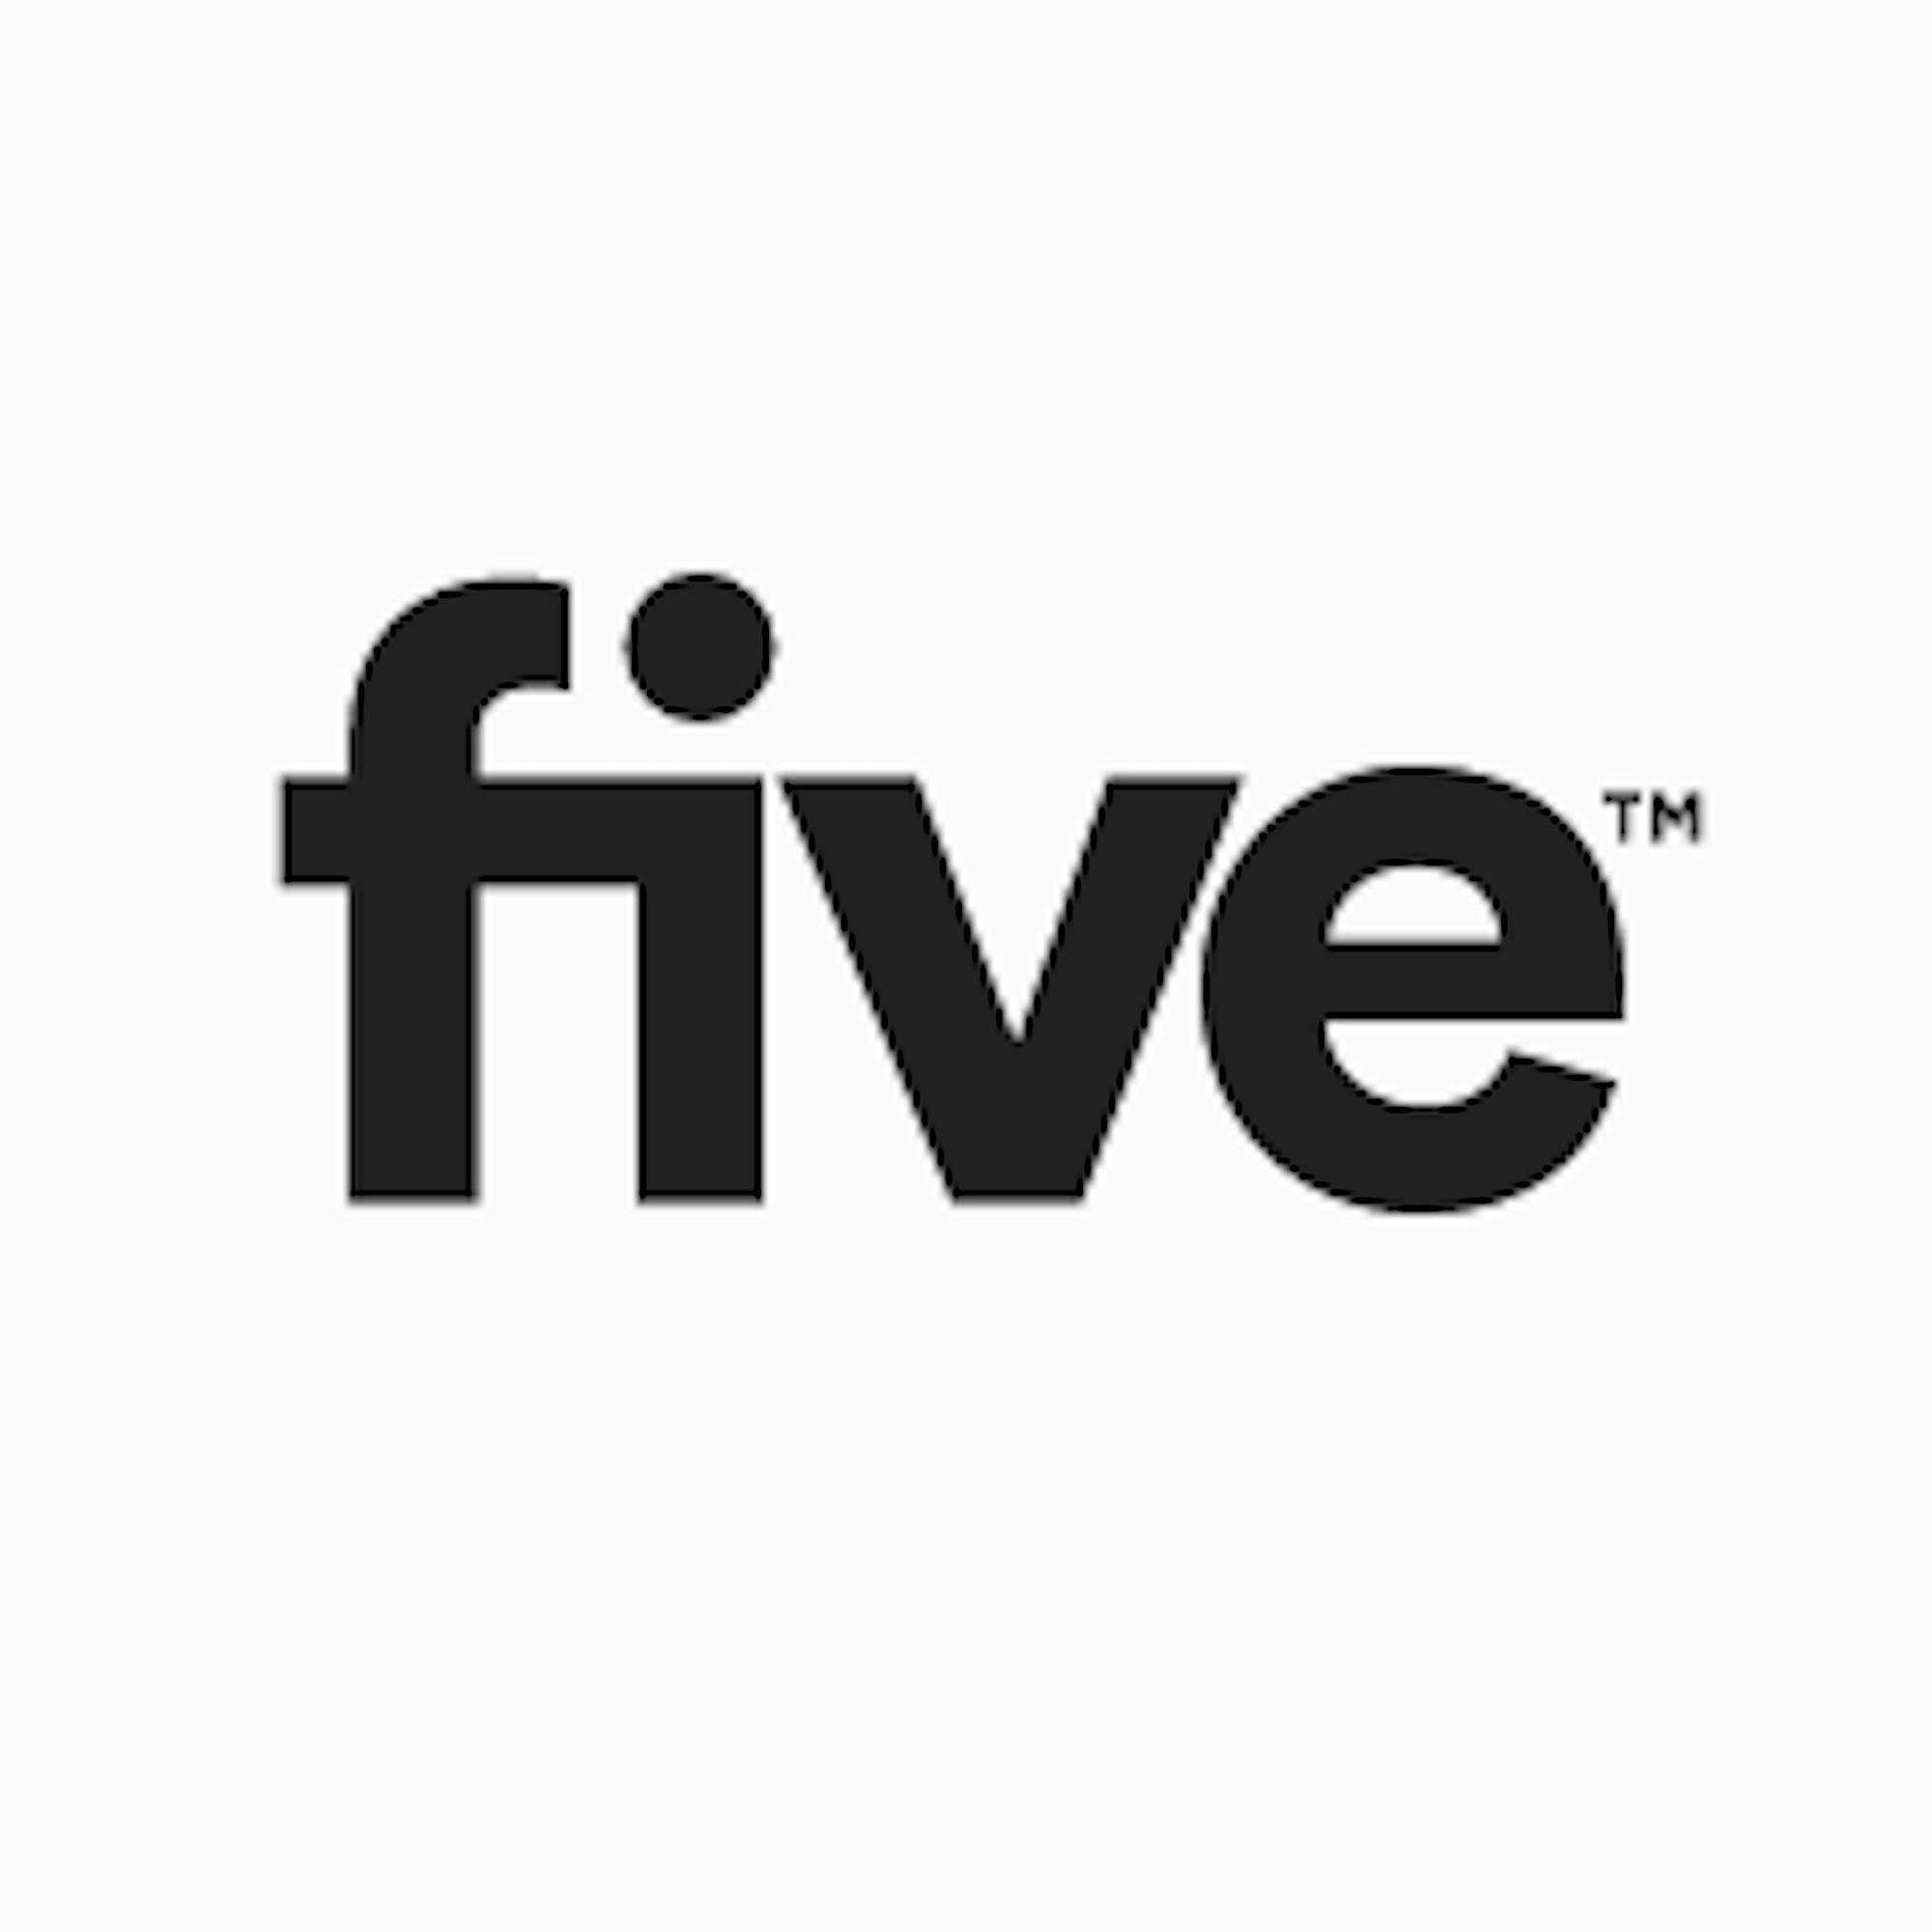 Five CBD logo